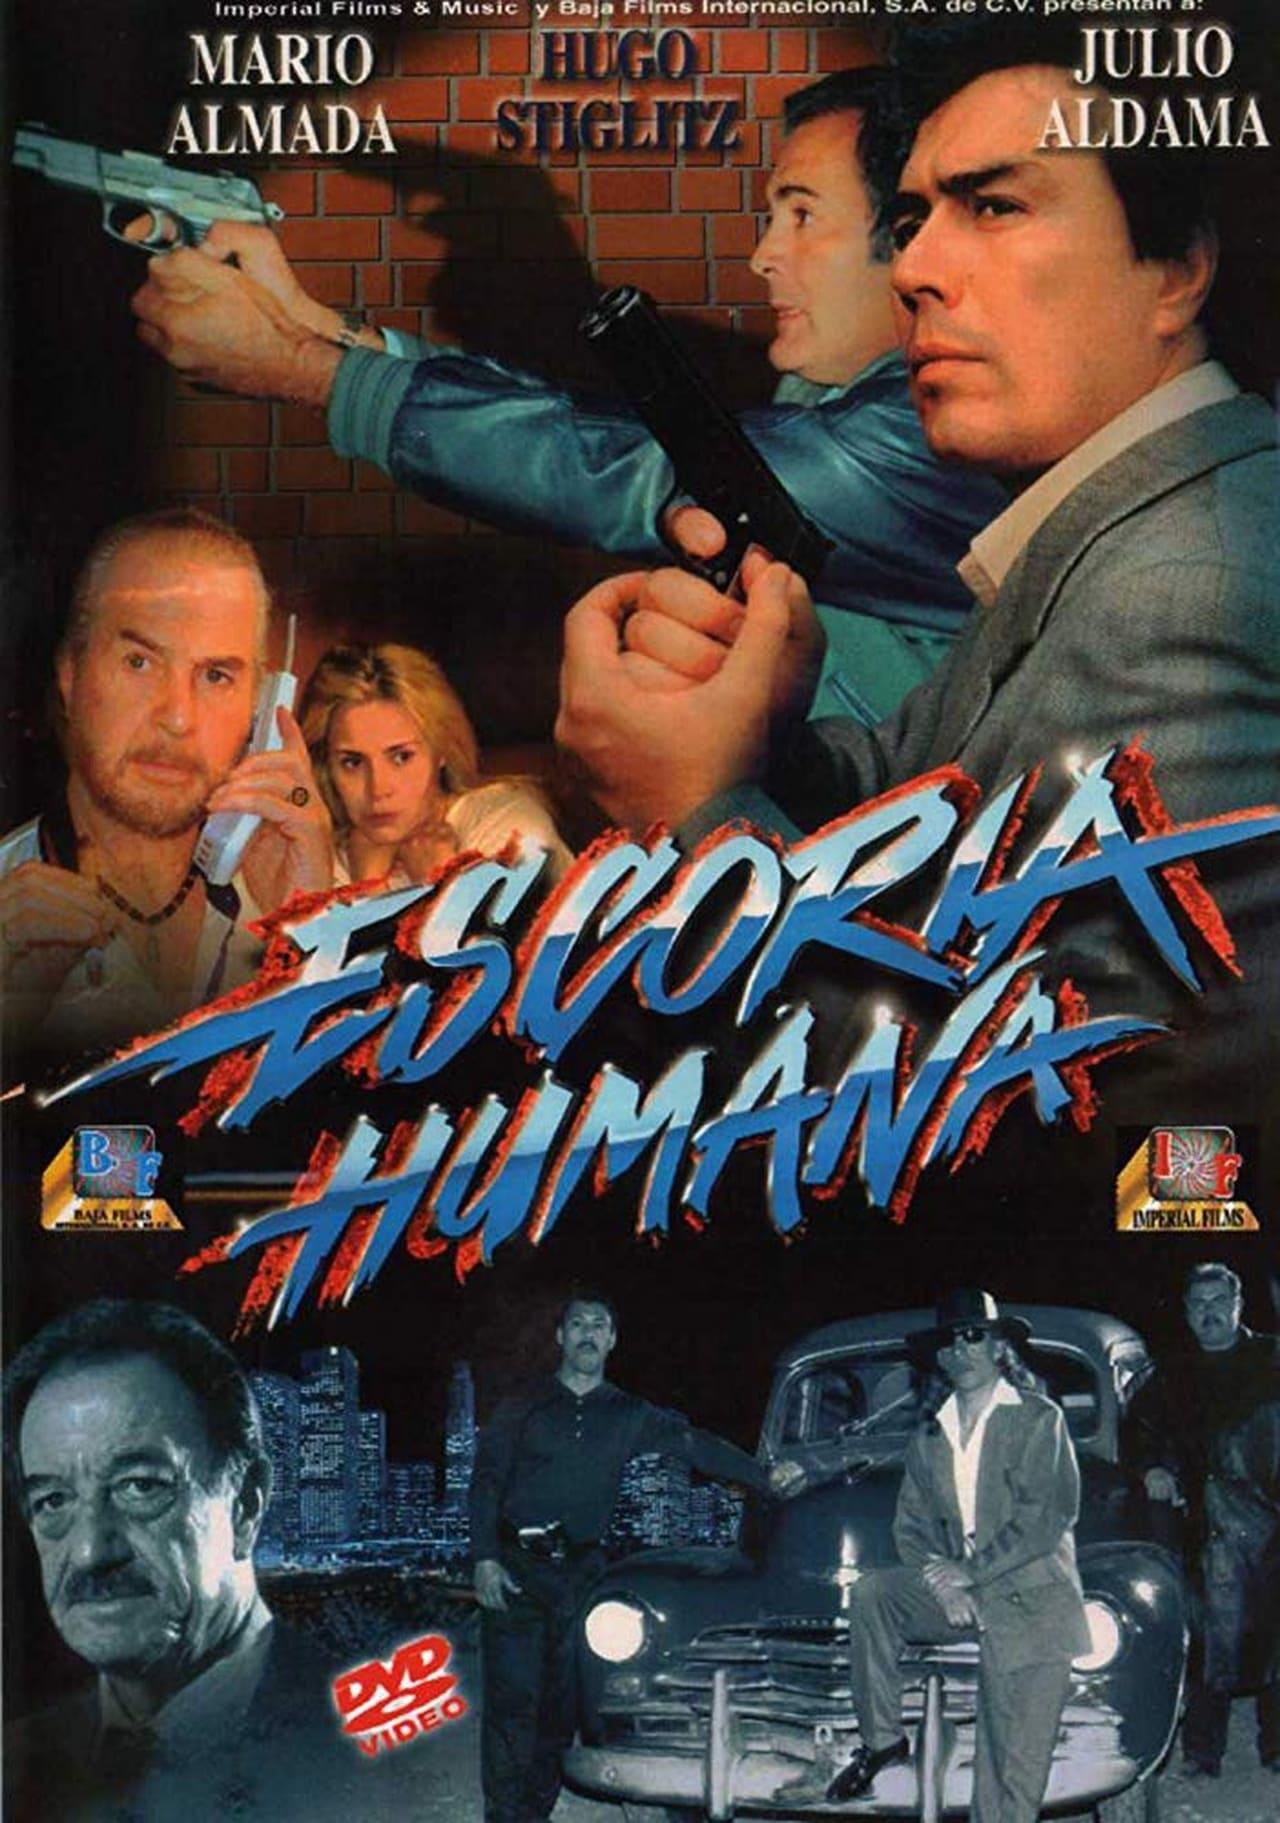 Escoria Humana (1999)